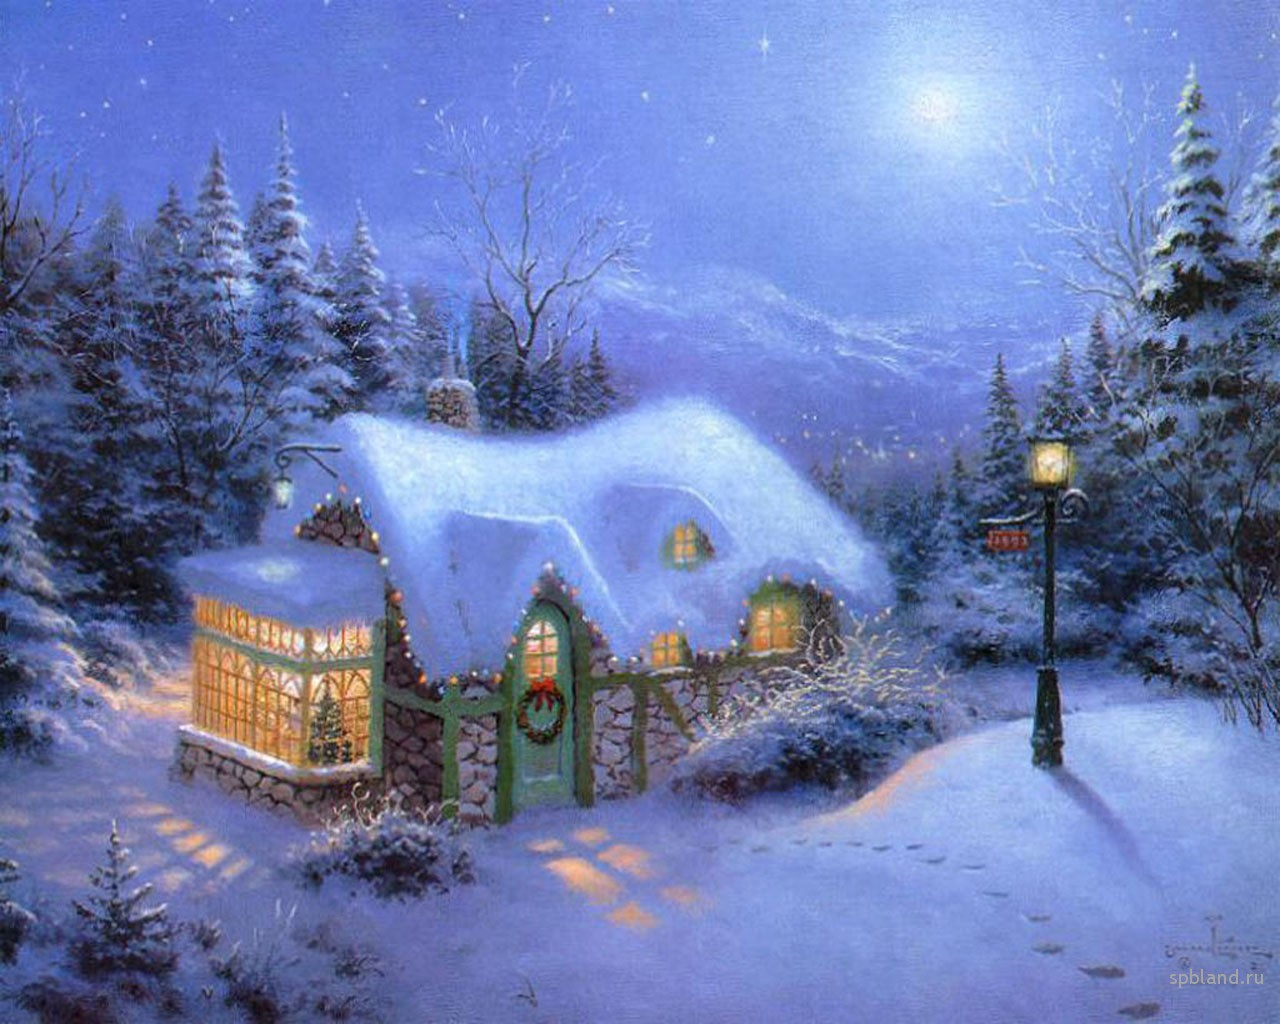 Christmas Wallpapers Merry Christmas Cards 1280x1024